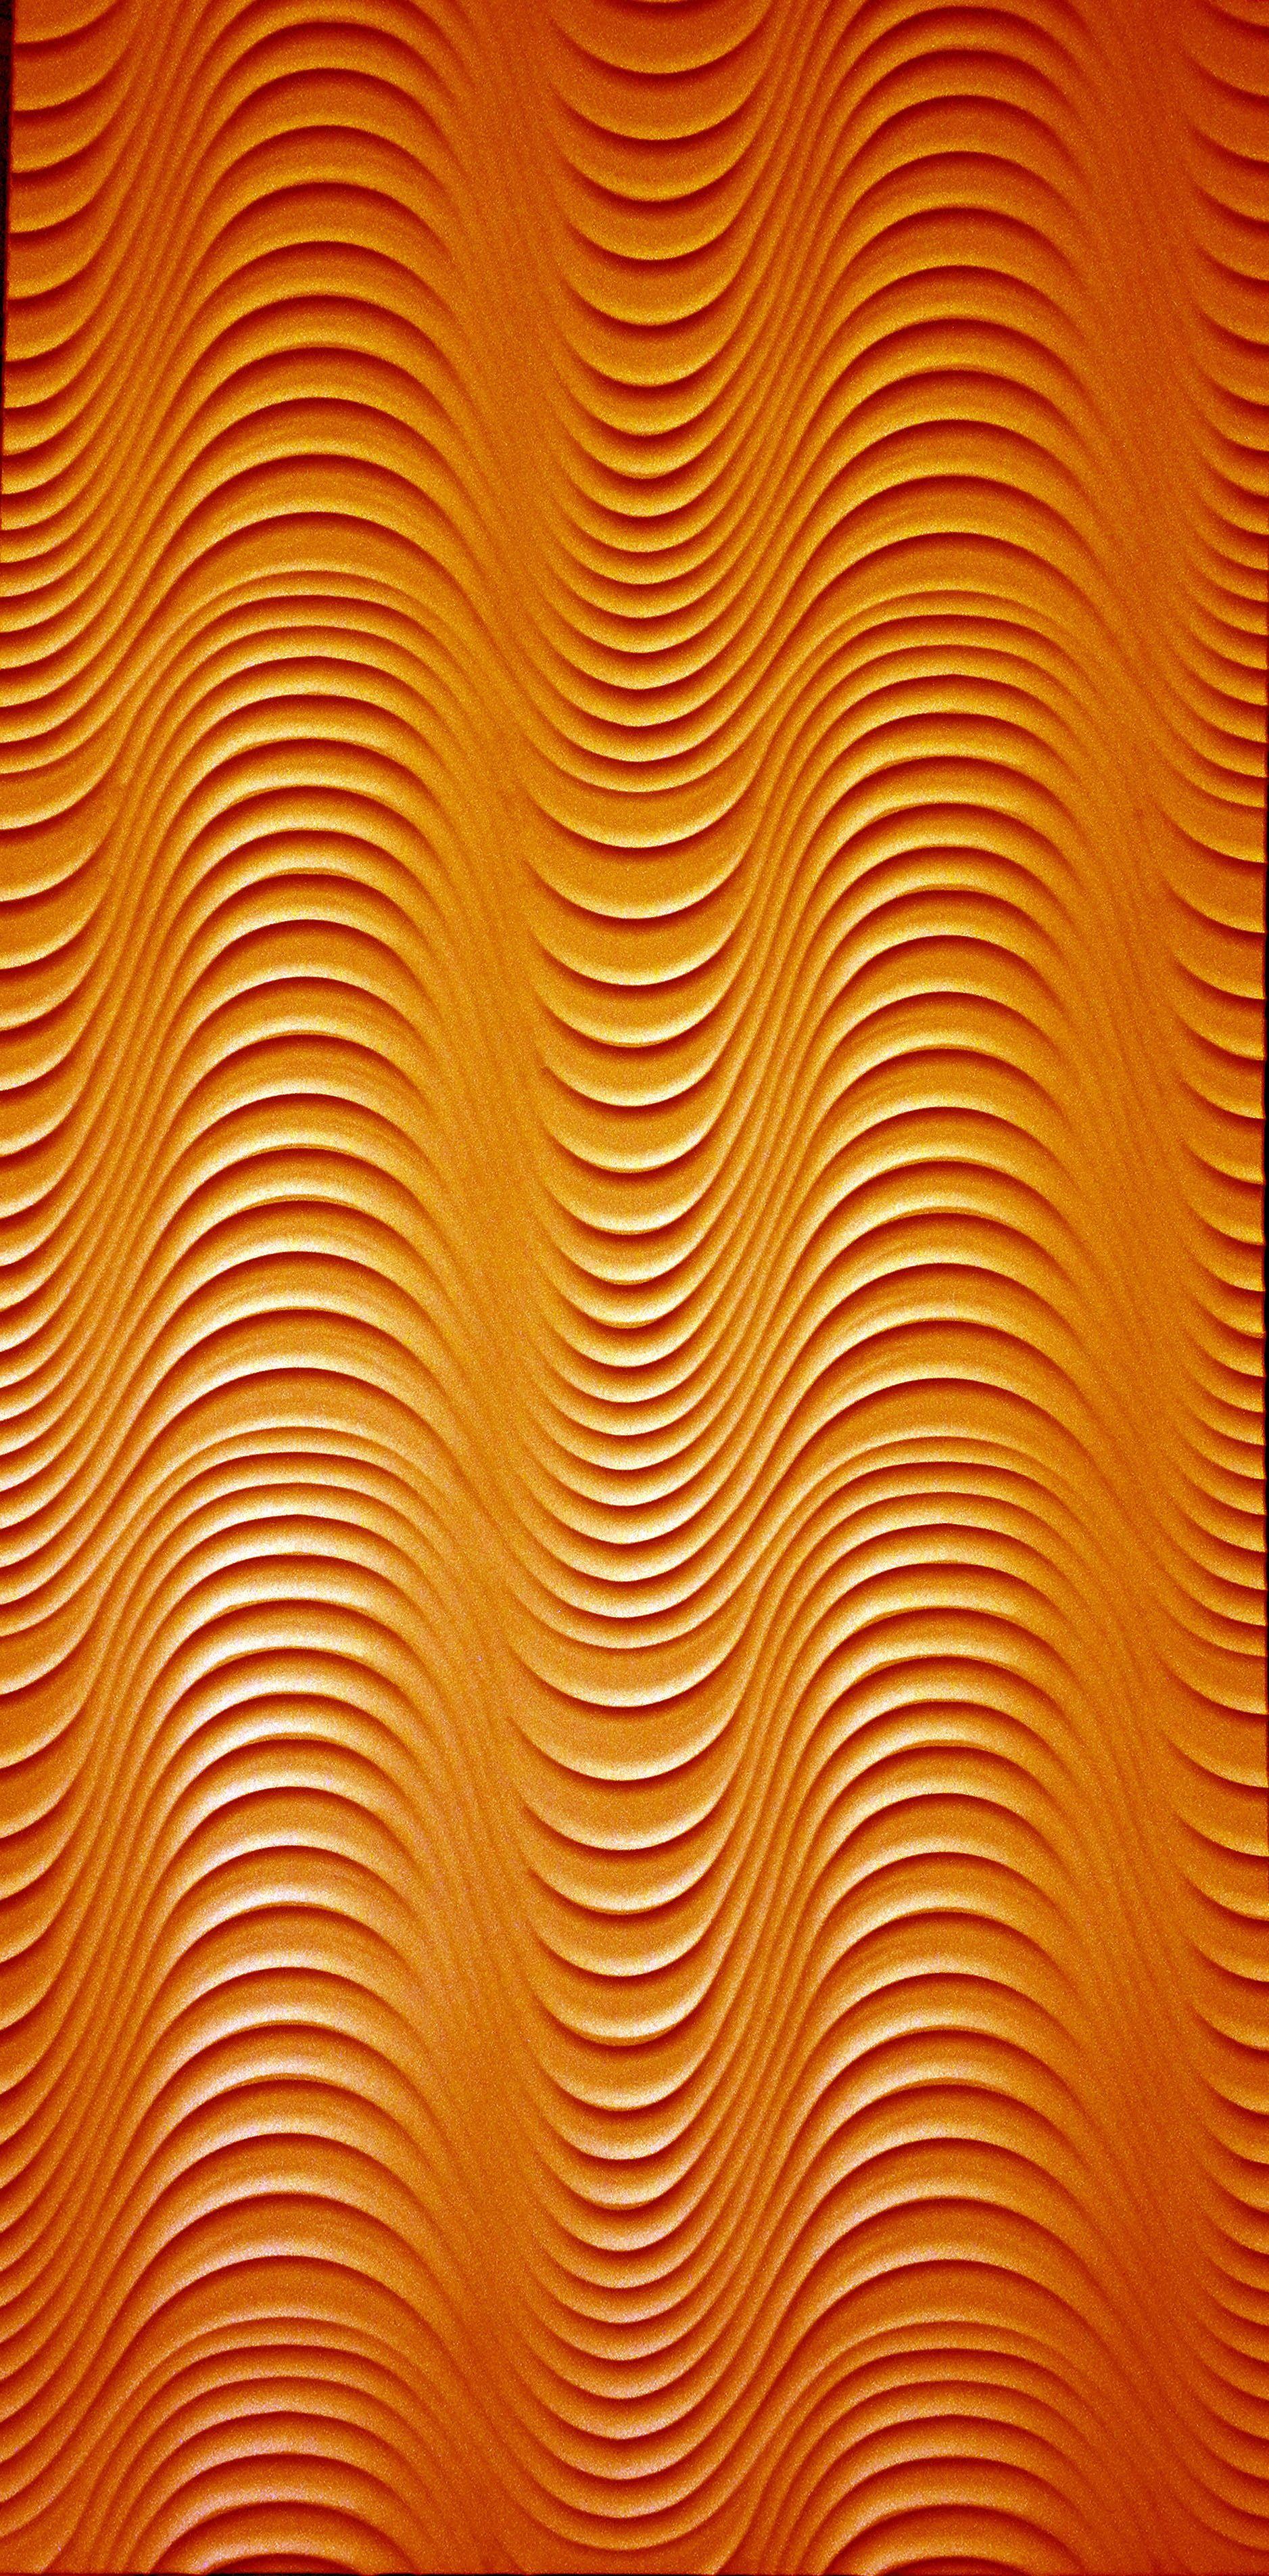 Textured wall panels google search salon looks - Plastic textured wall panels ...